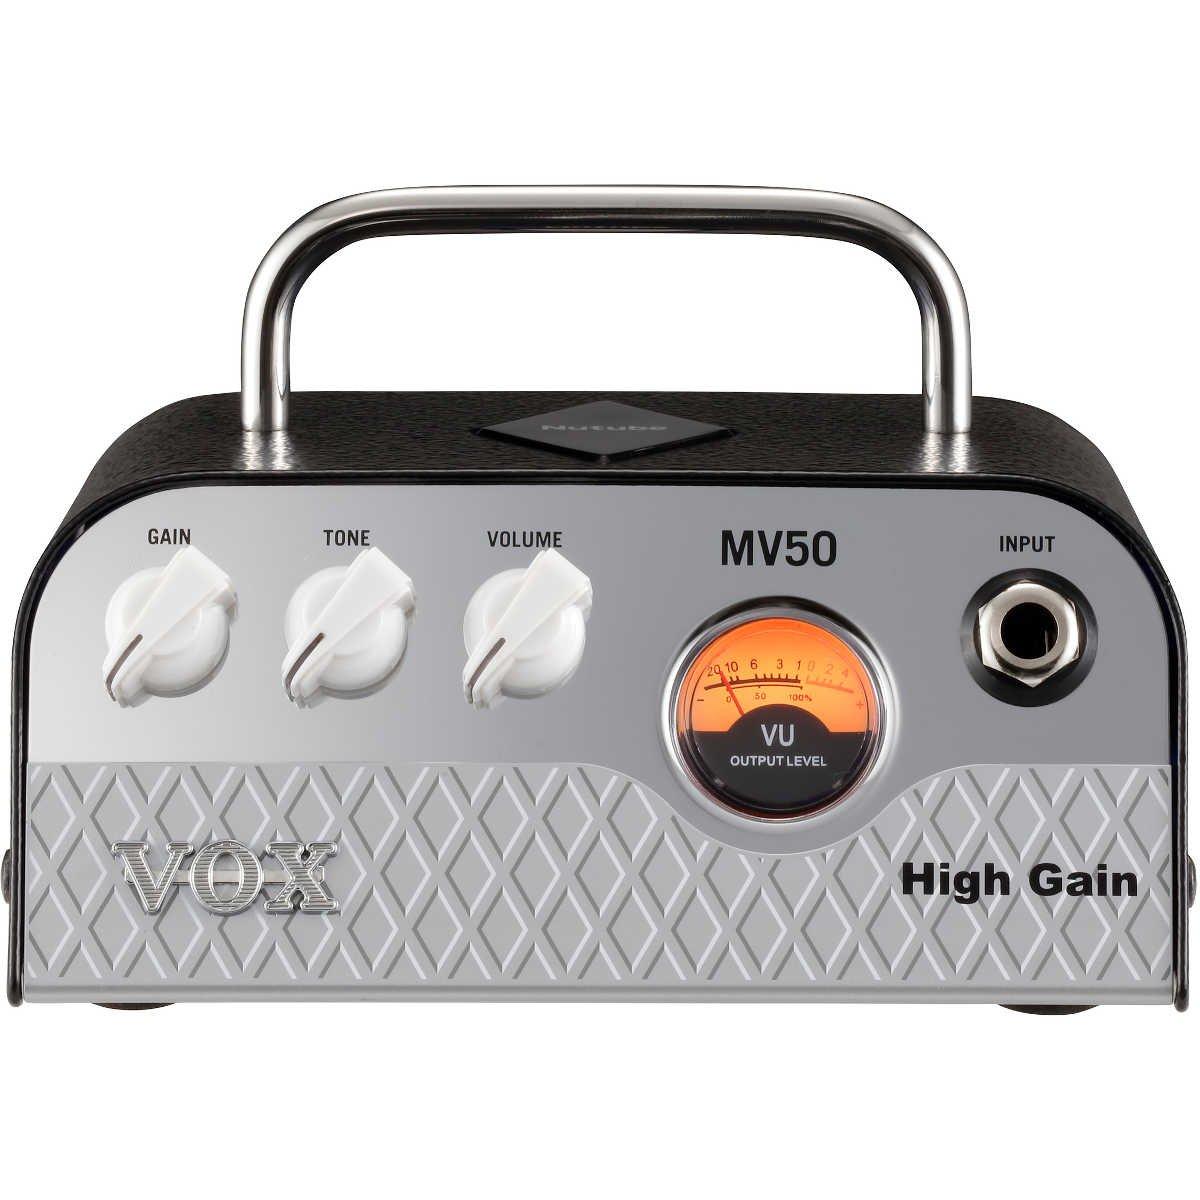 Vox MV50 High Gain guitar amplifier head £99 delivered at Dawsons